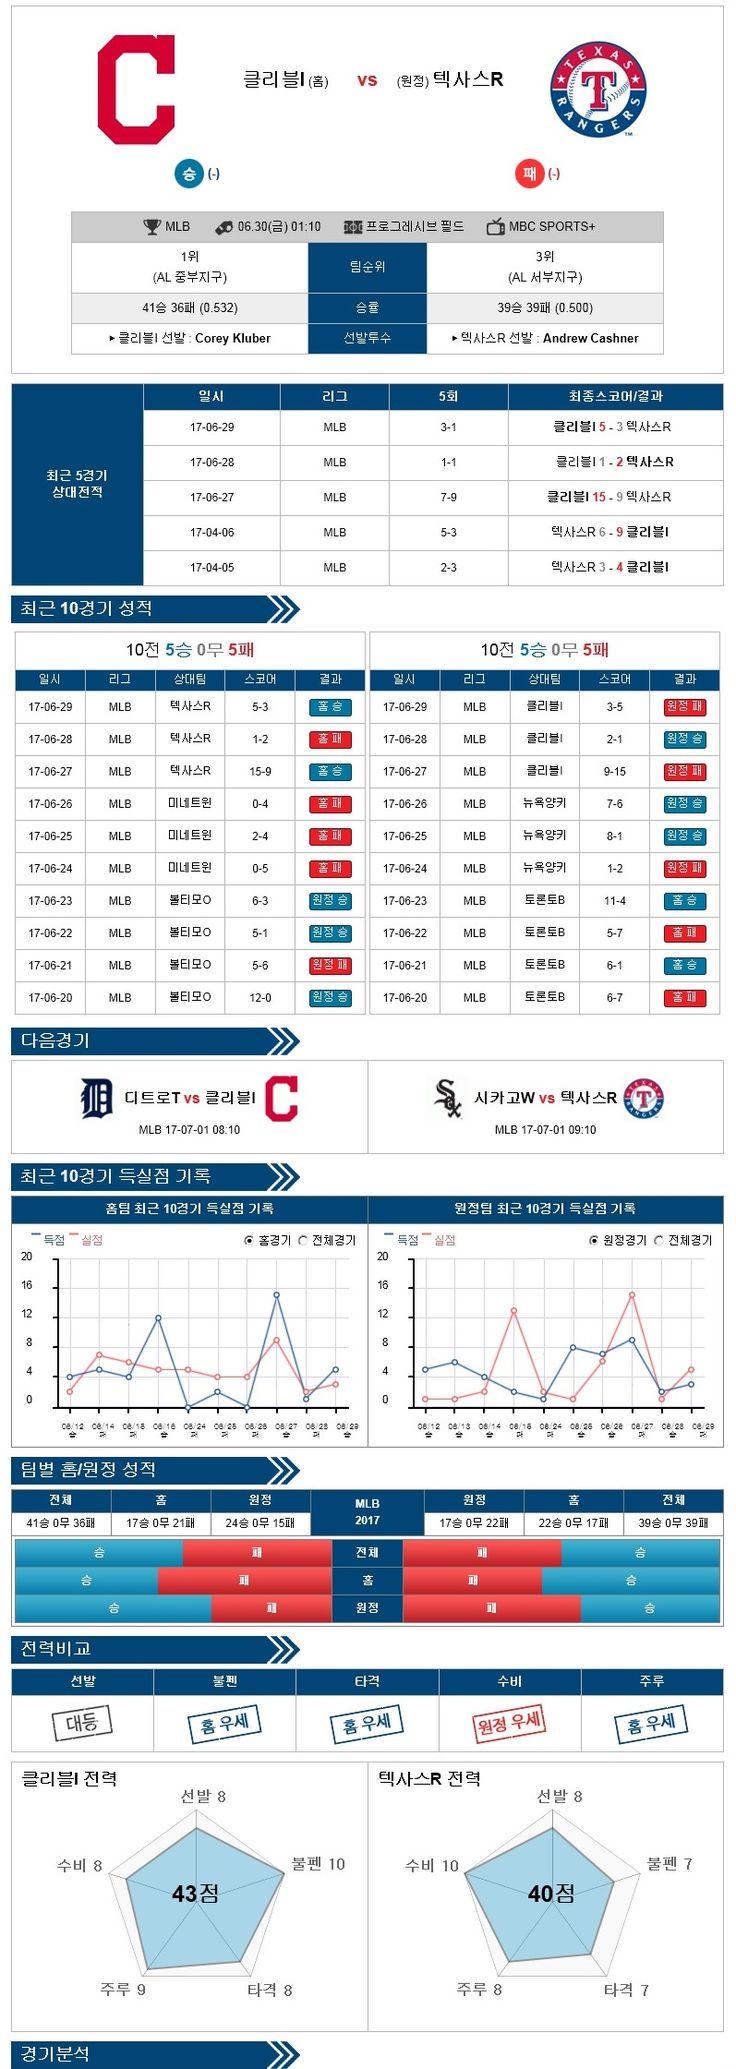 [MLB] 6월 30일 야구분석픽 클리블랜드 vs 텍사스 ★토토군 분석픽★